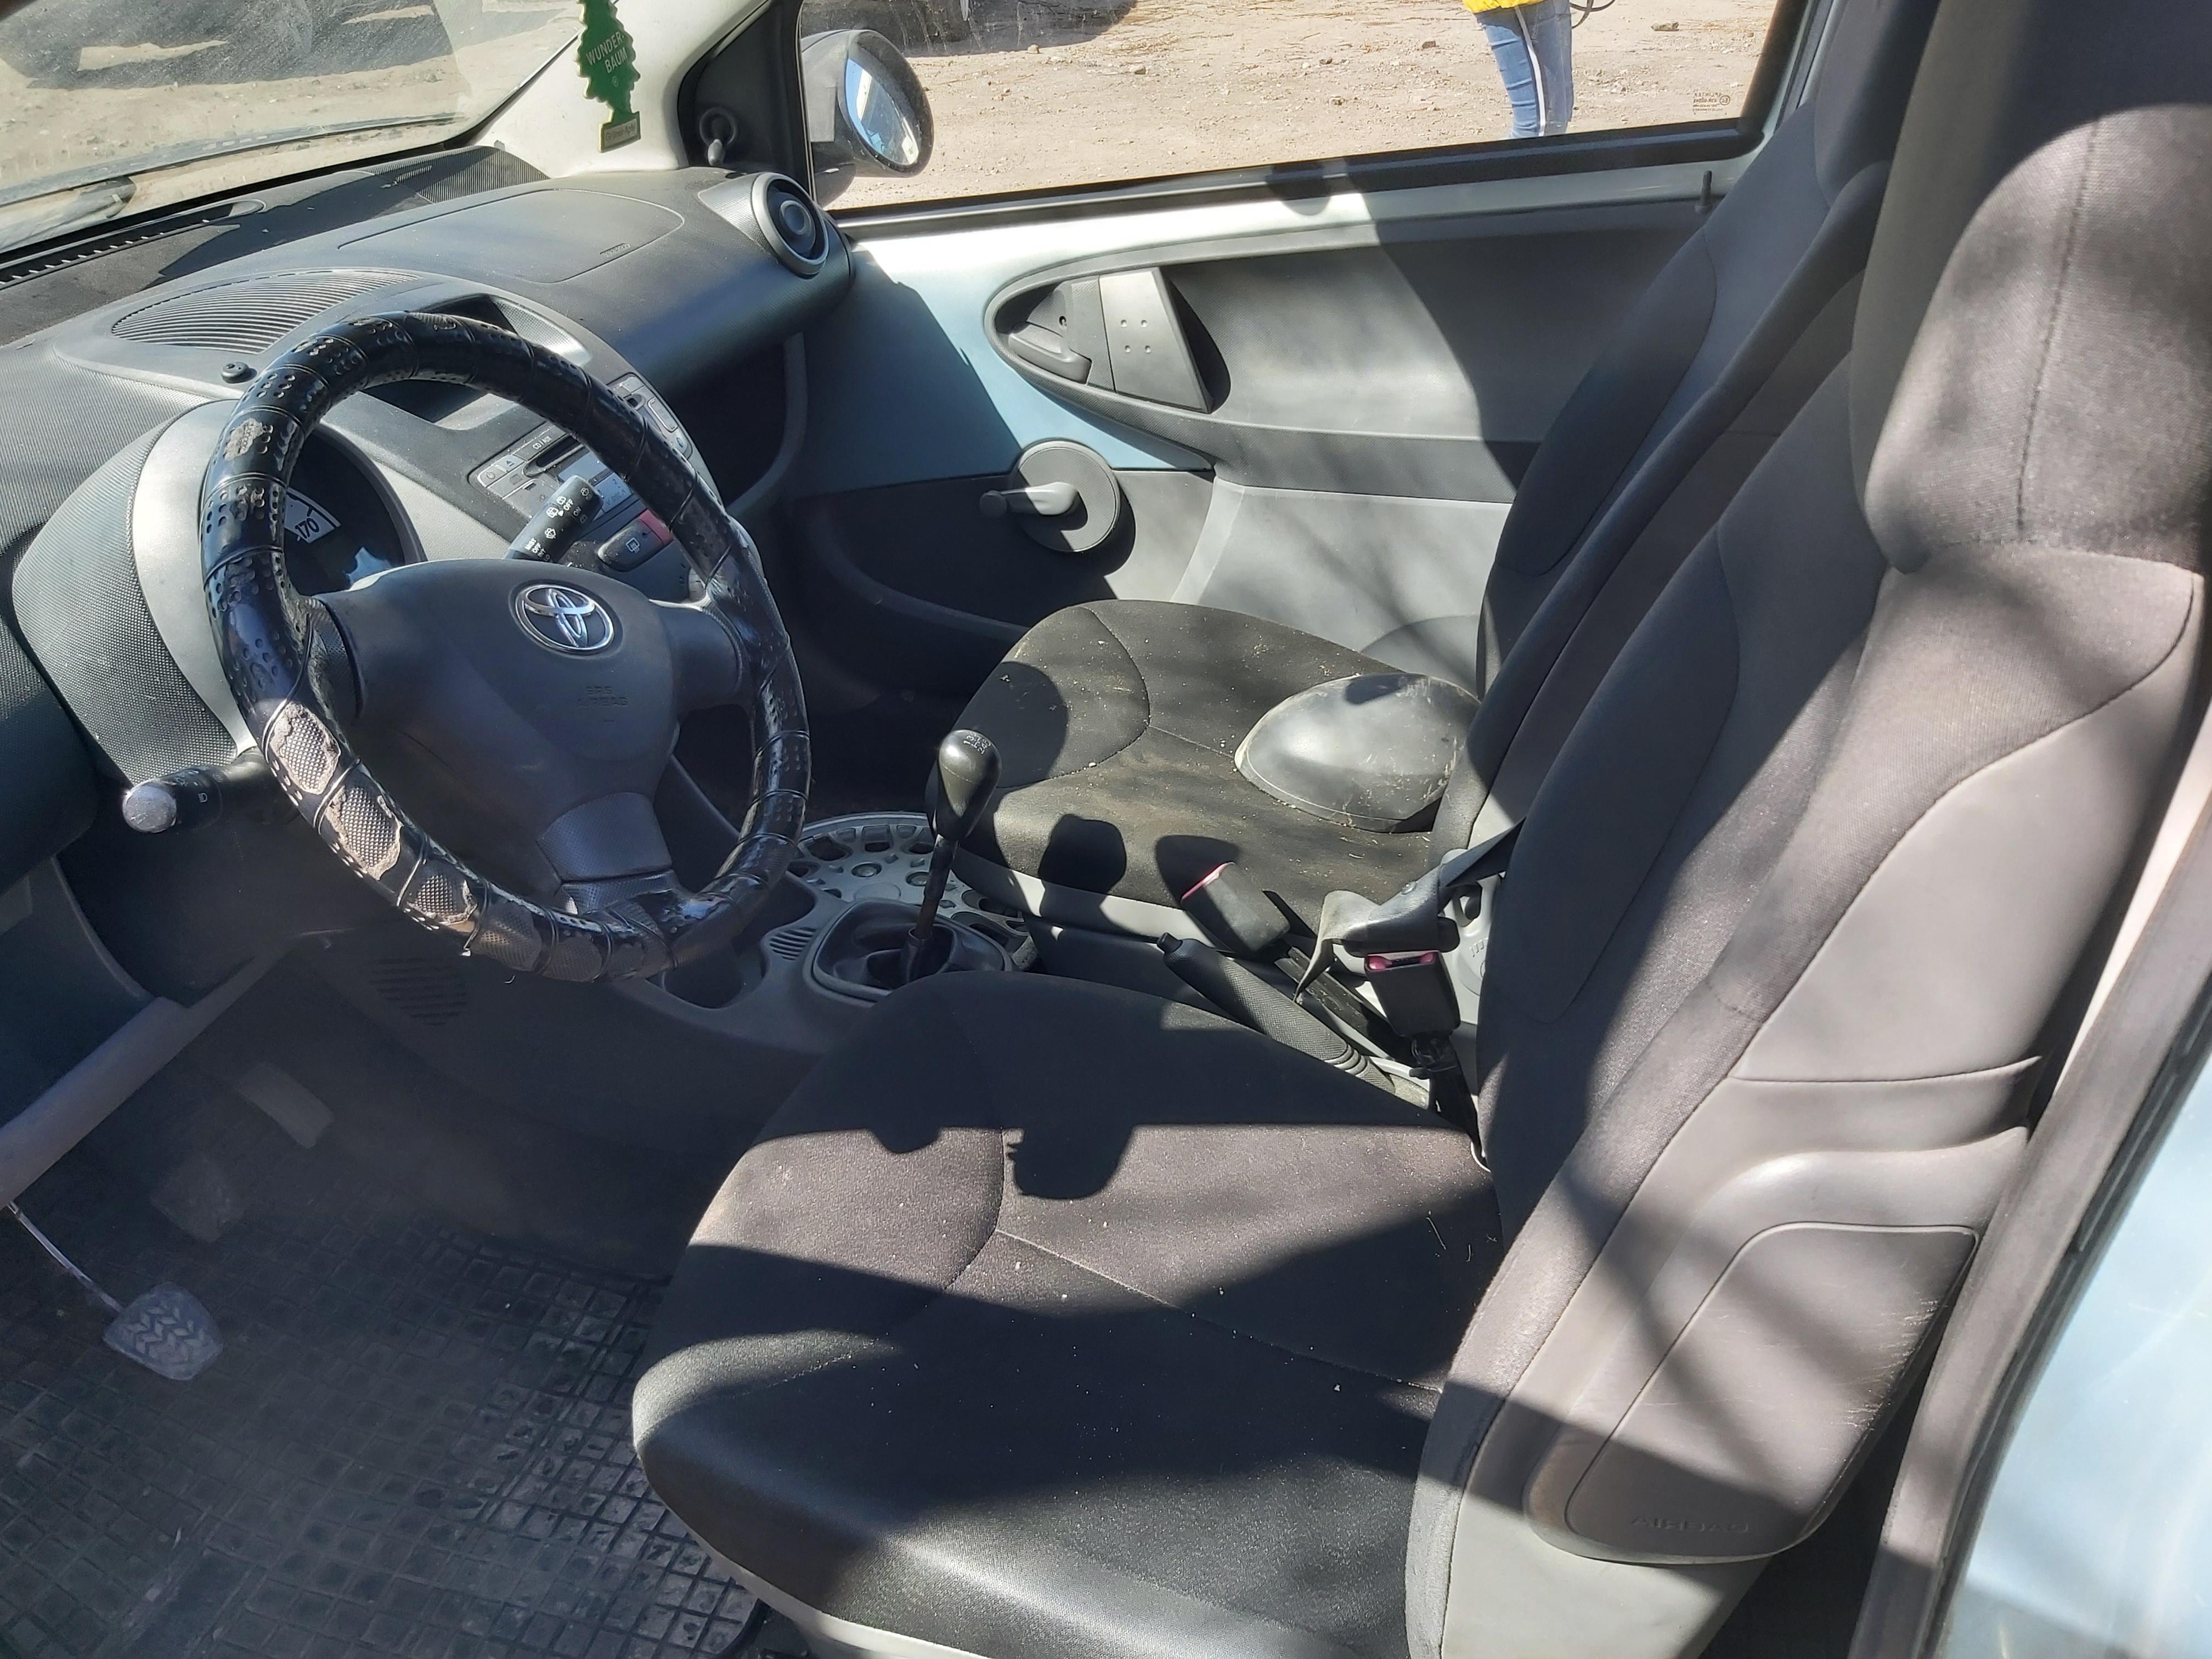 Used Car Parts Toyota AYGO 2008 1.0 Mechanical Hatchback 2/3 d. Cerulean 2020-4-22